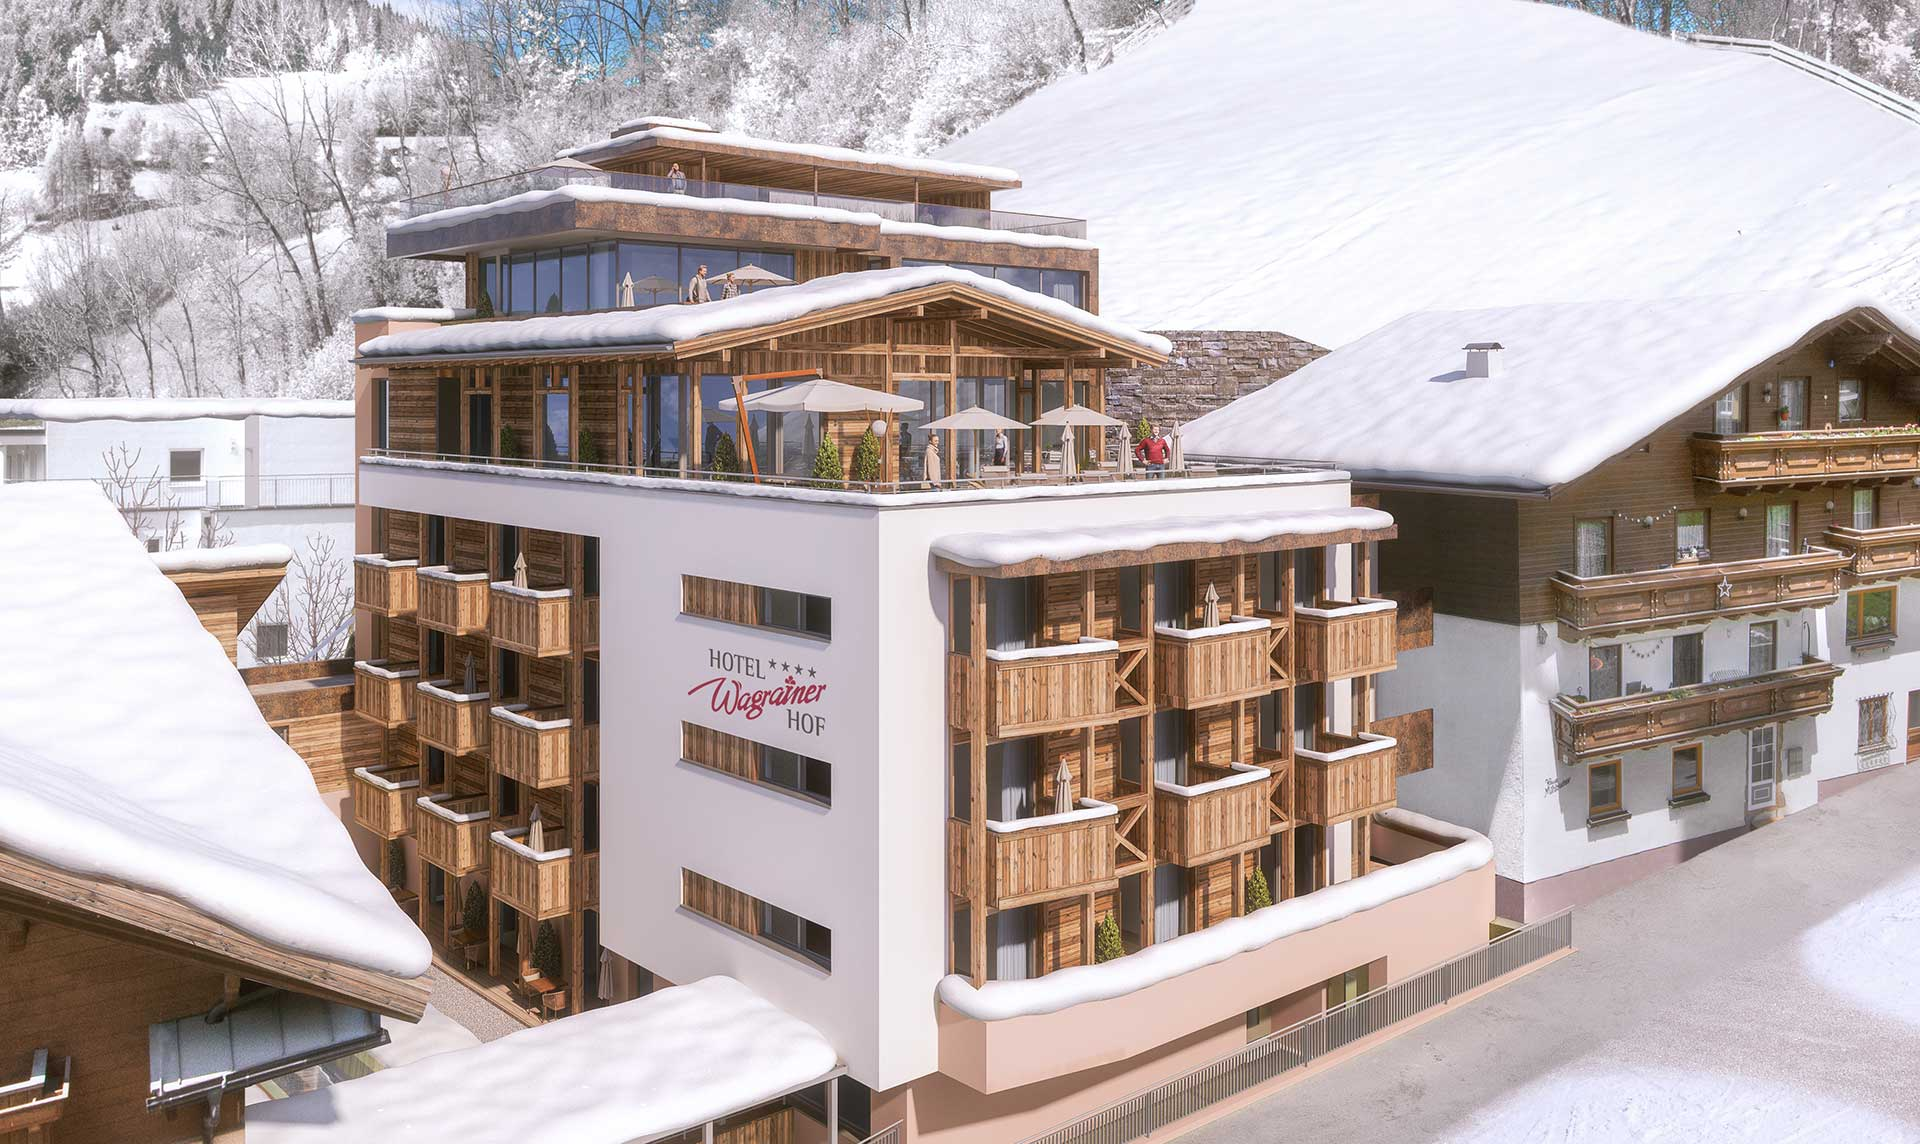 Skihotel in Wagrain, Ski amadé, Salzburg